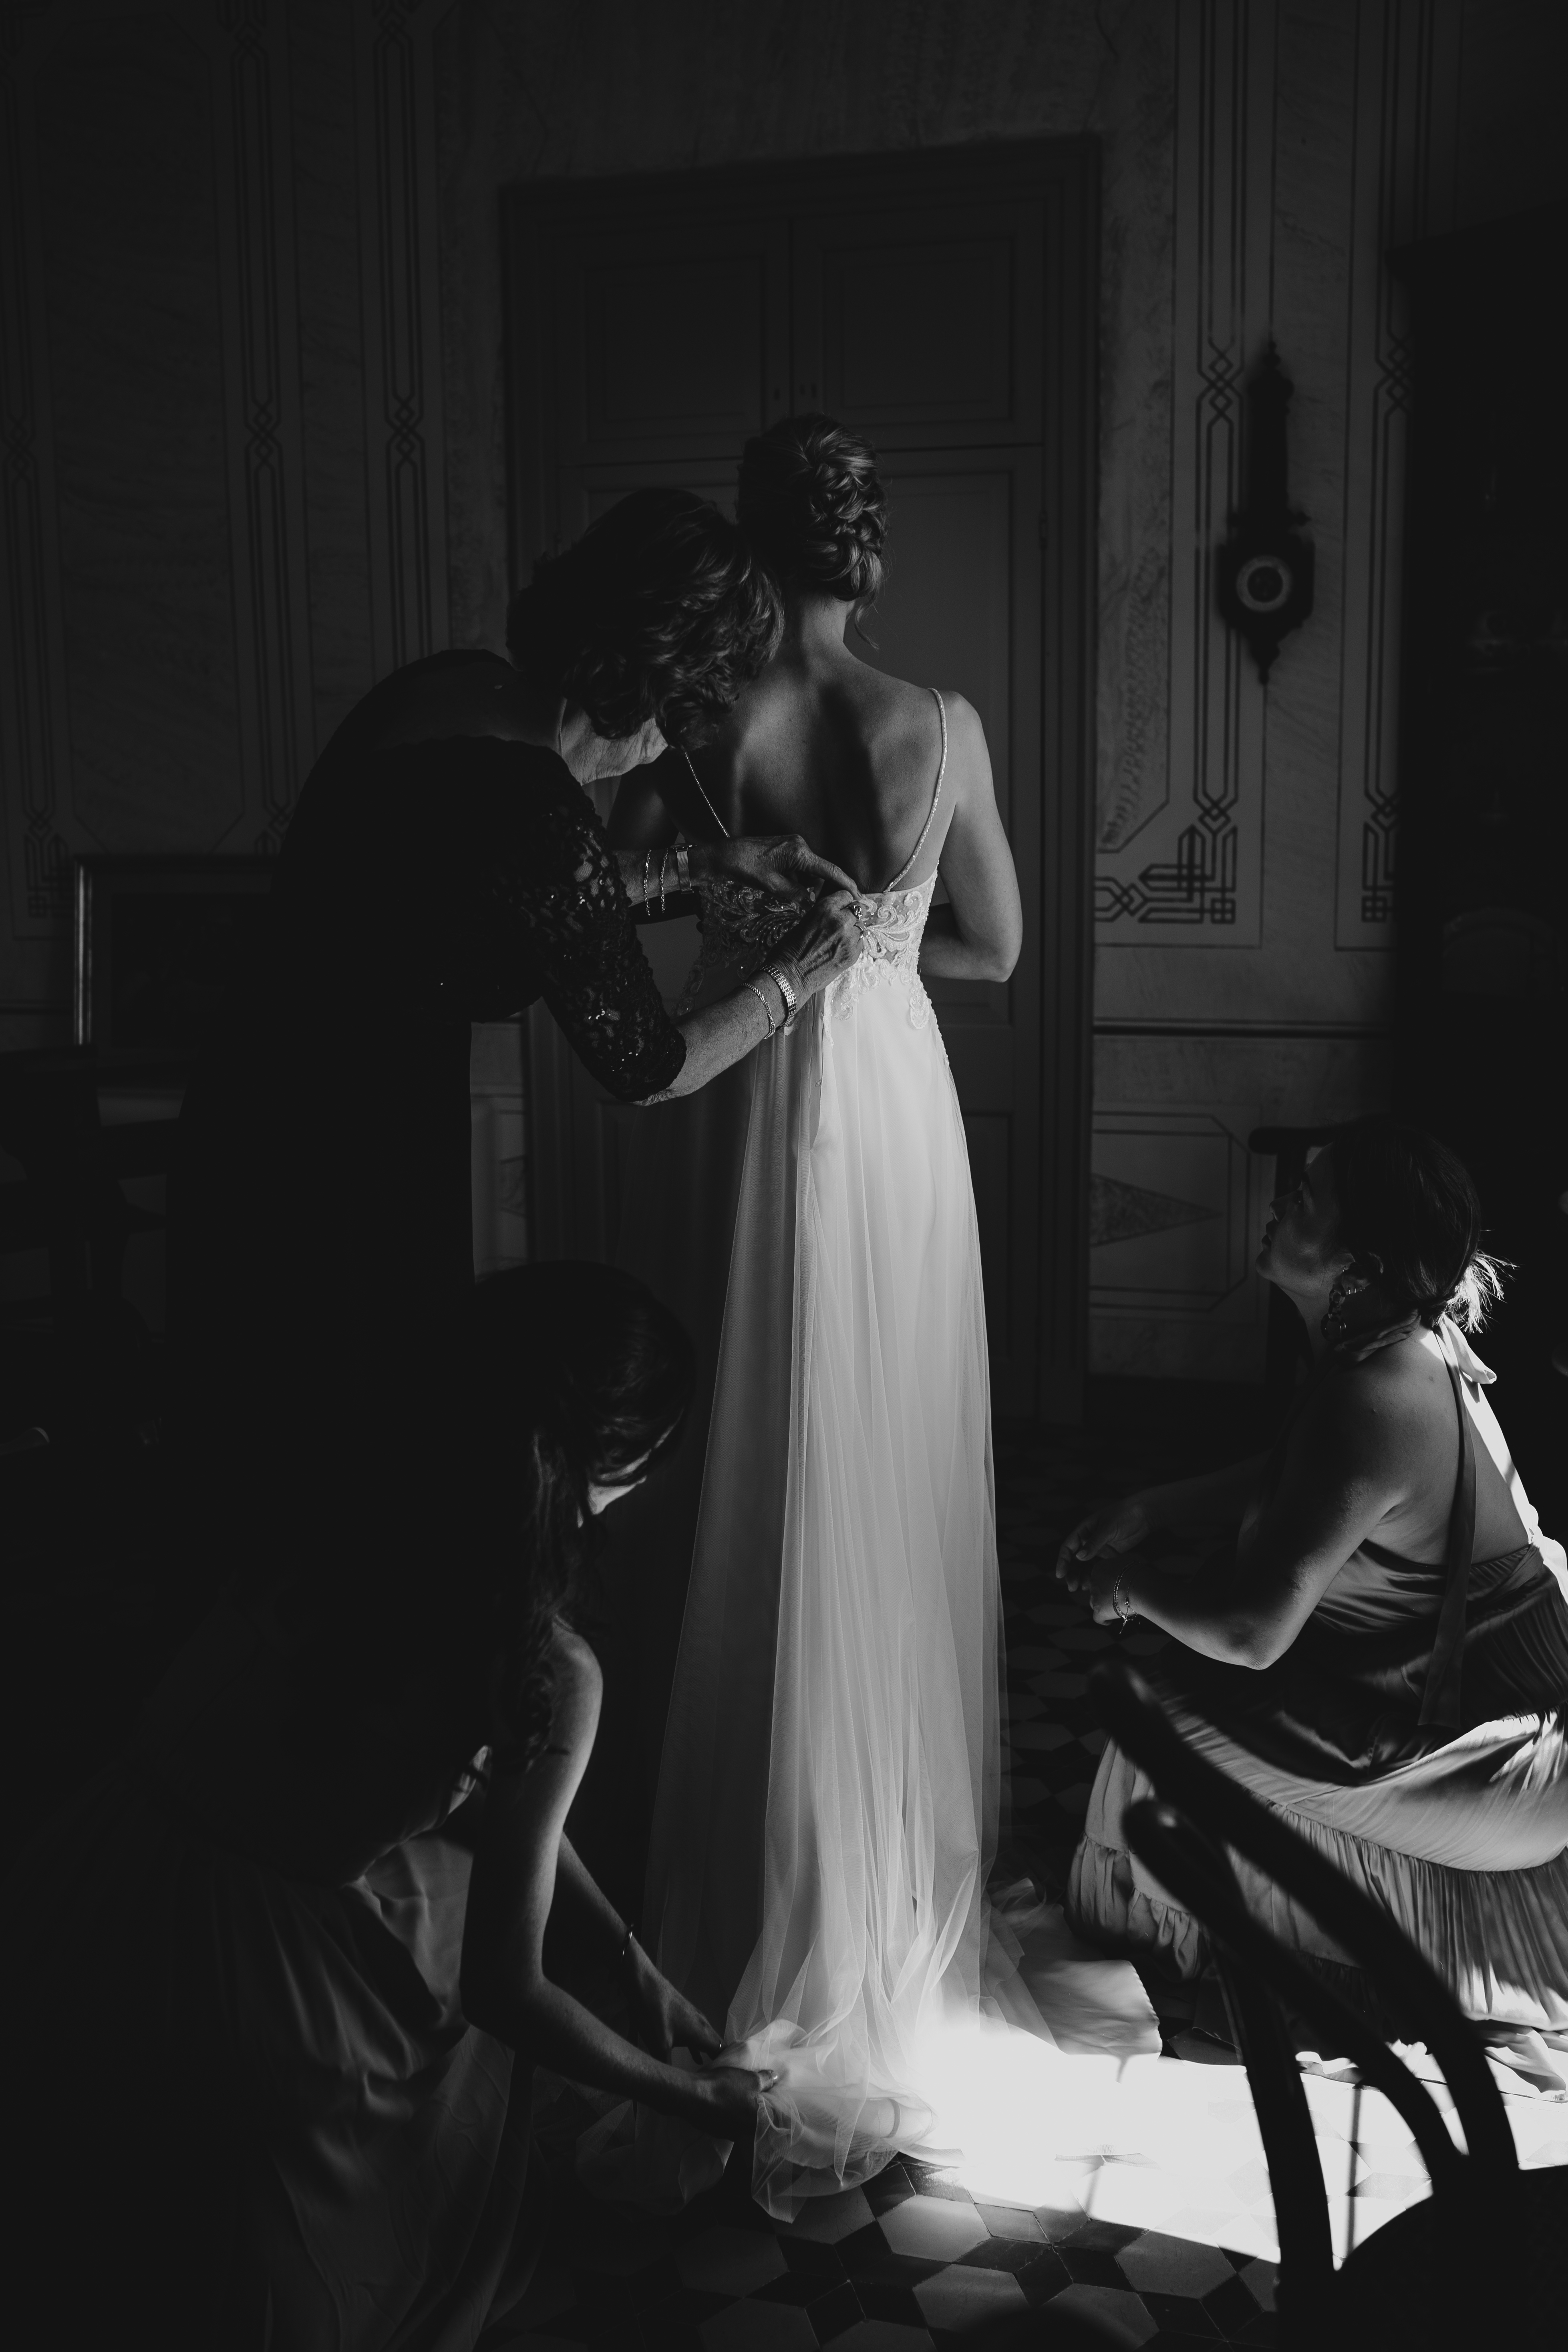 20190601 - Wedding Iris & Vicente15